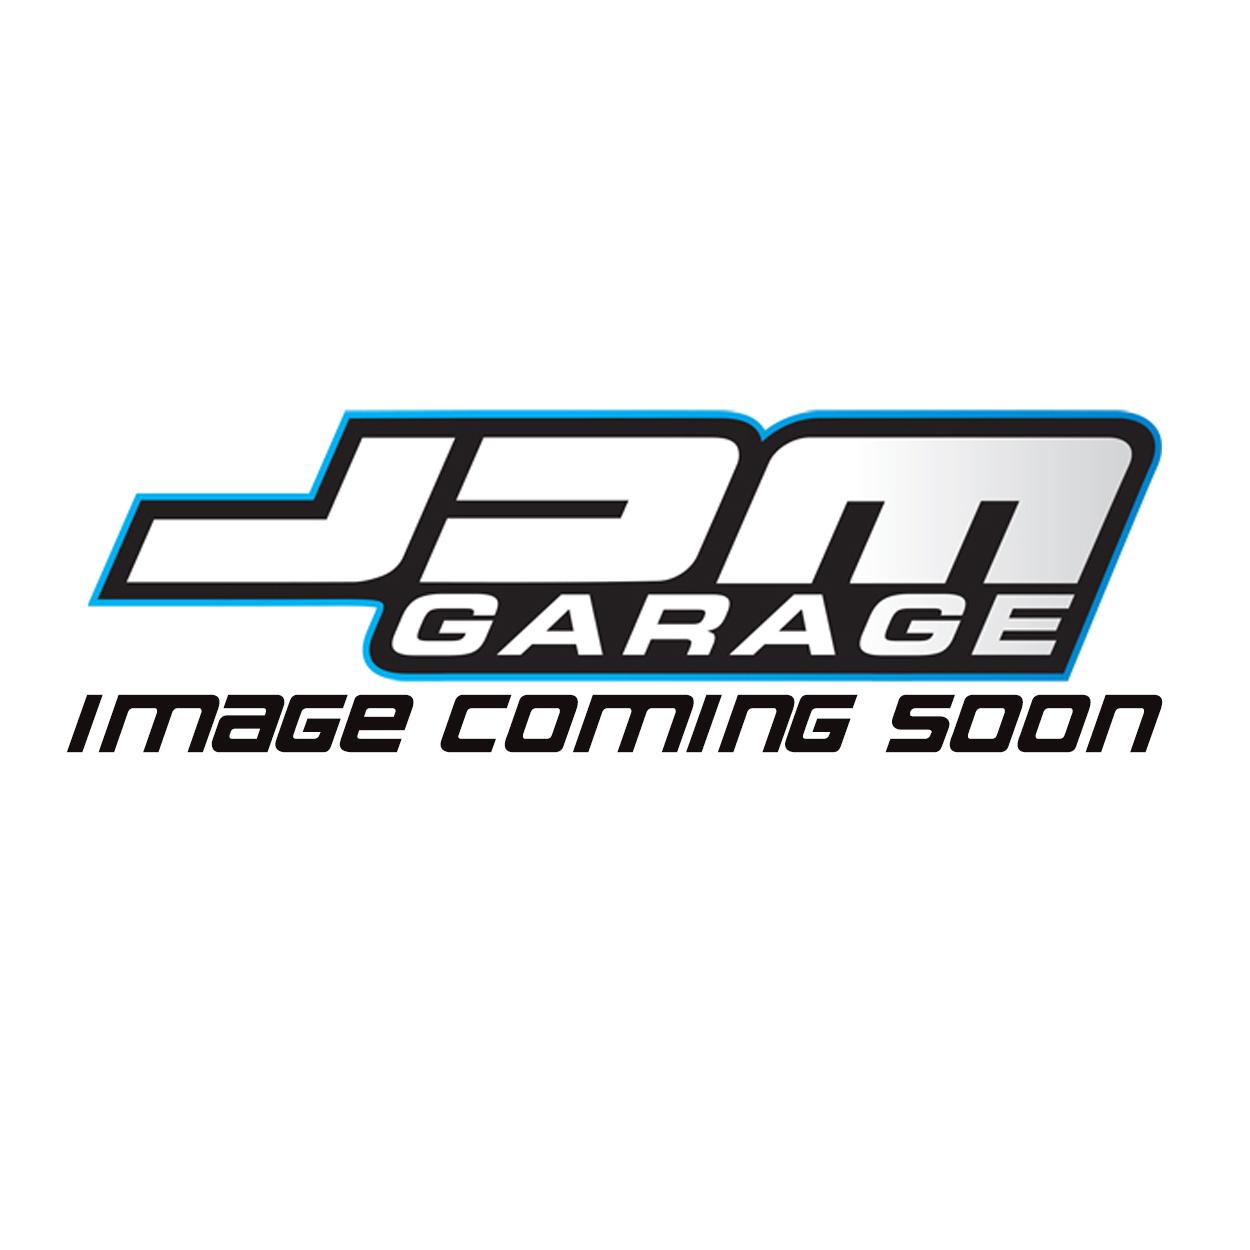 Genuine Nissan Throttle Body Gasket For Nissan Skyline R34 GTT Stagea WC34 RB25DET NEO 16175-31U01